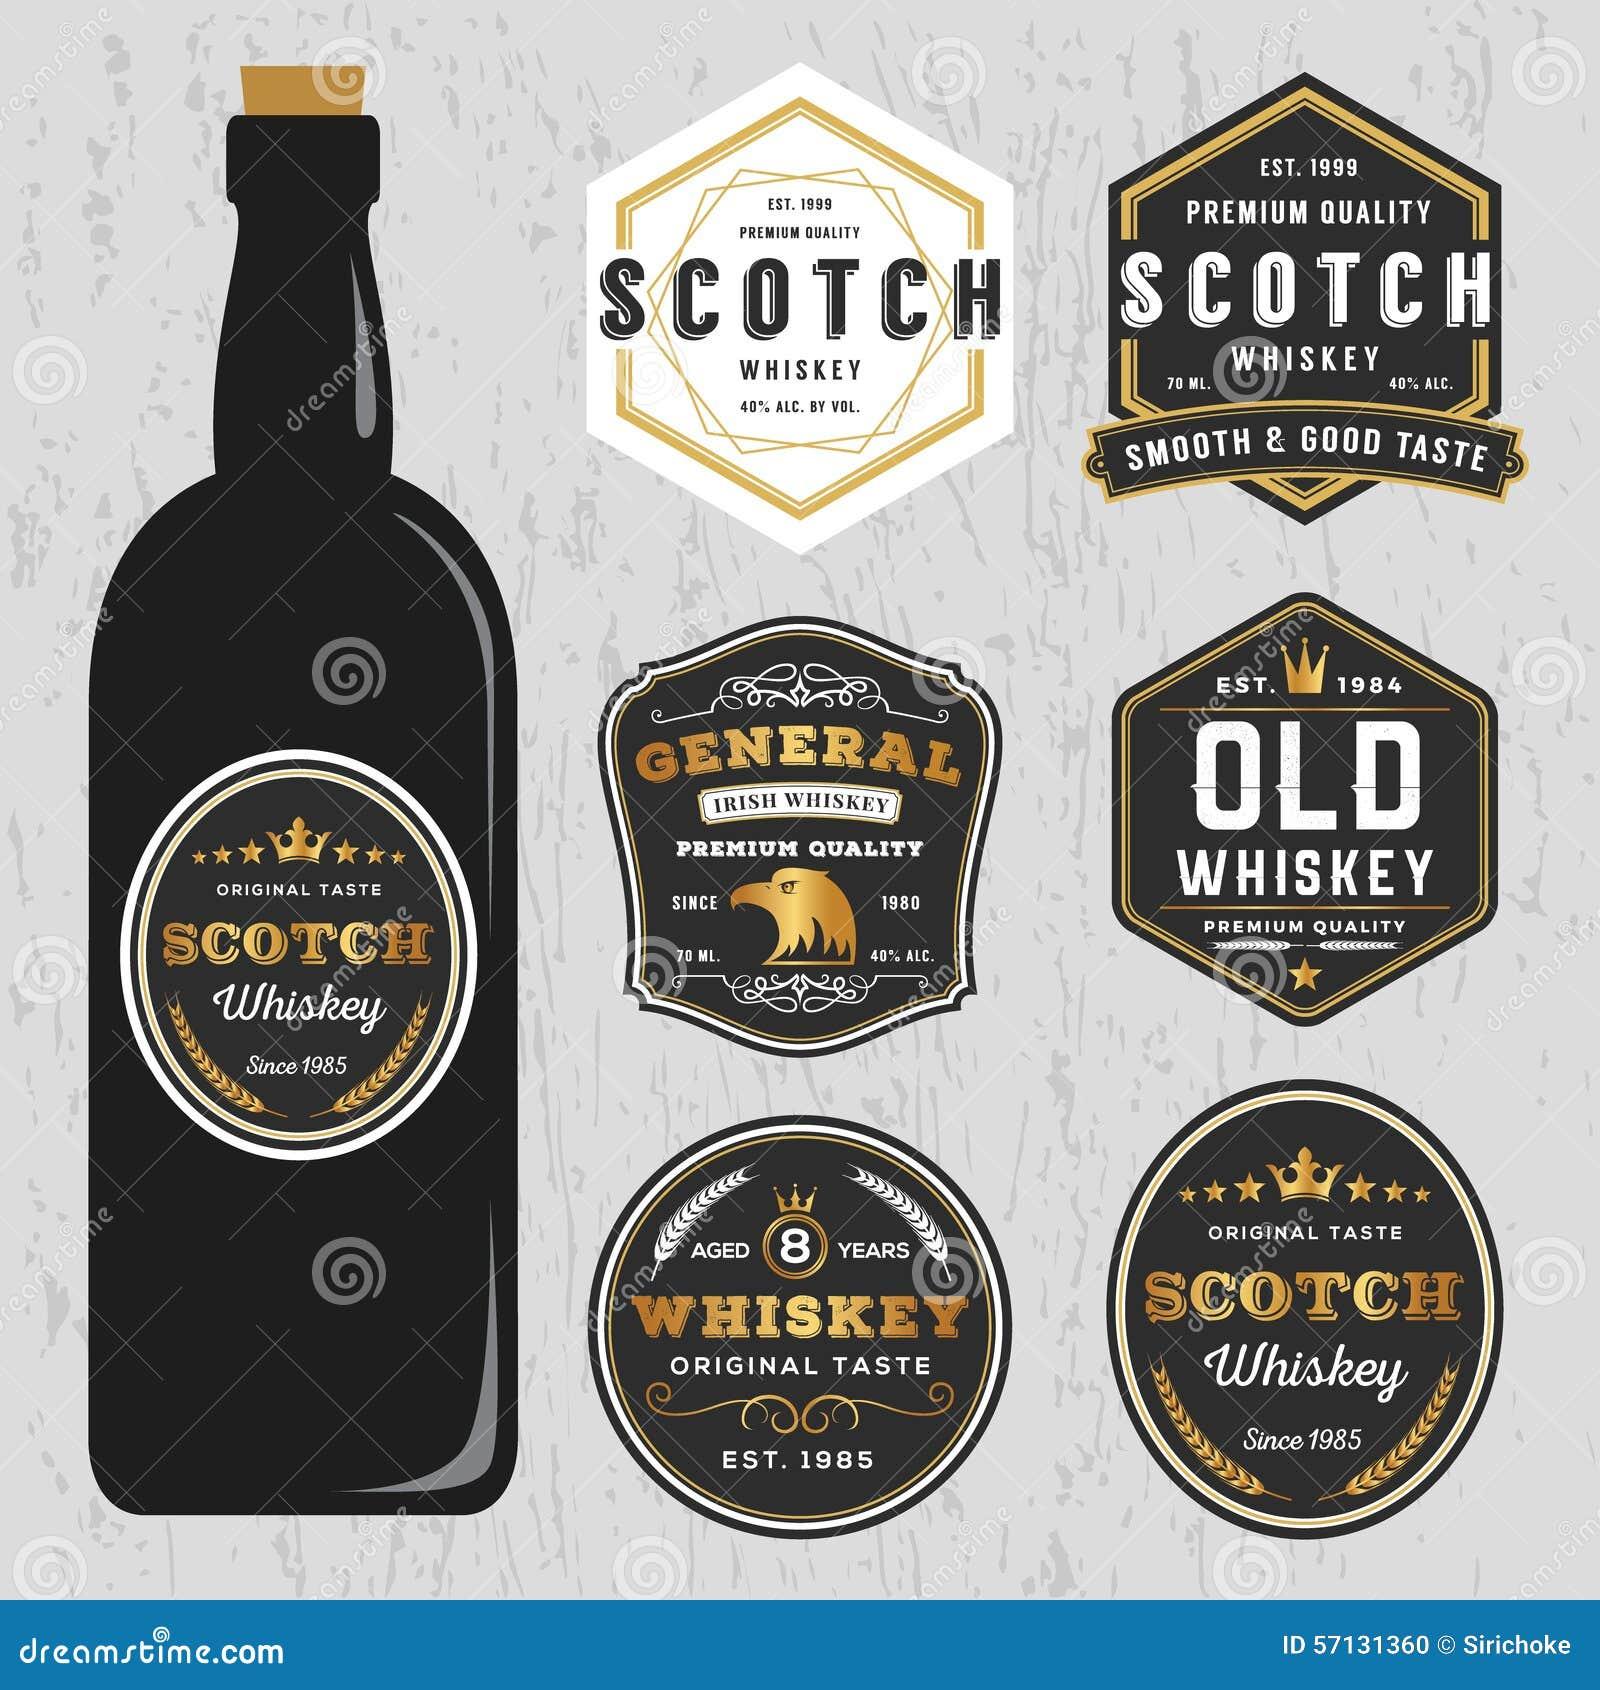 Vintage Premium Whiskey Brands Label Design Template Stock Vector ...